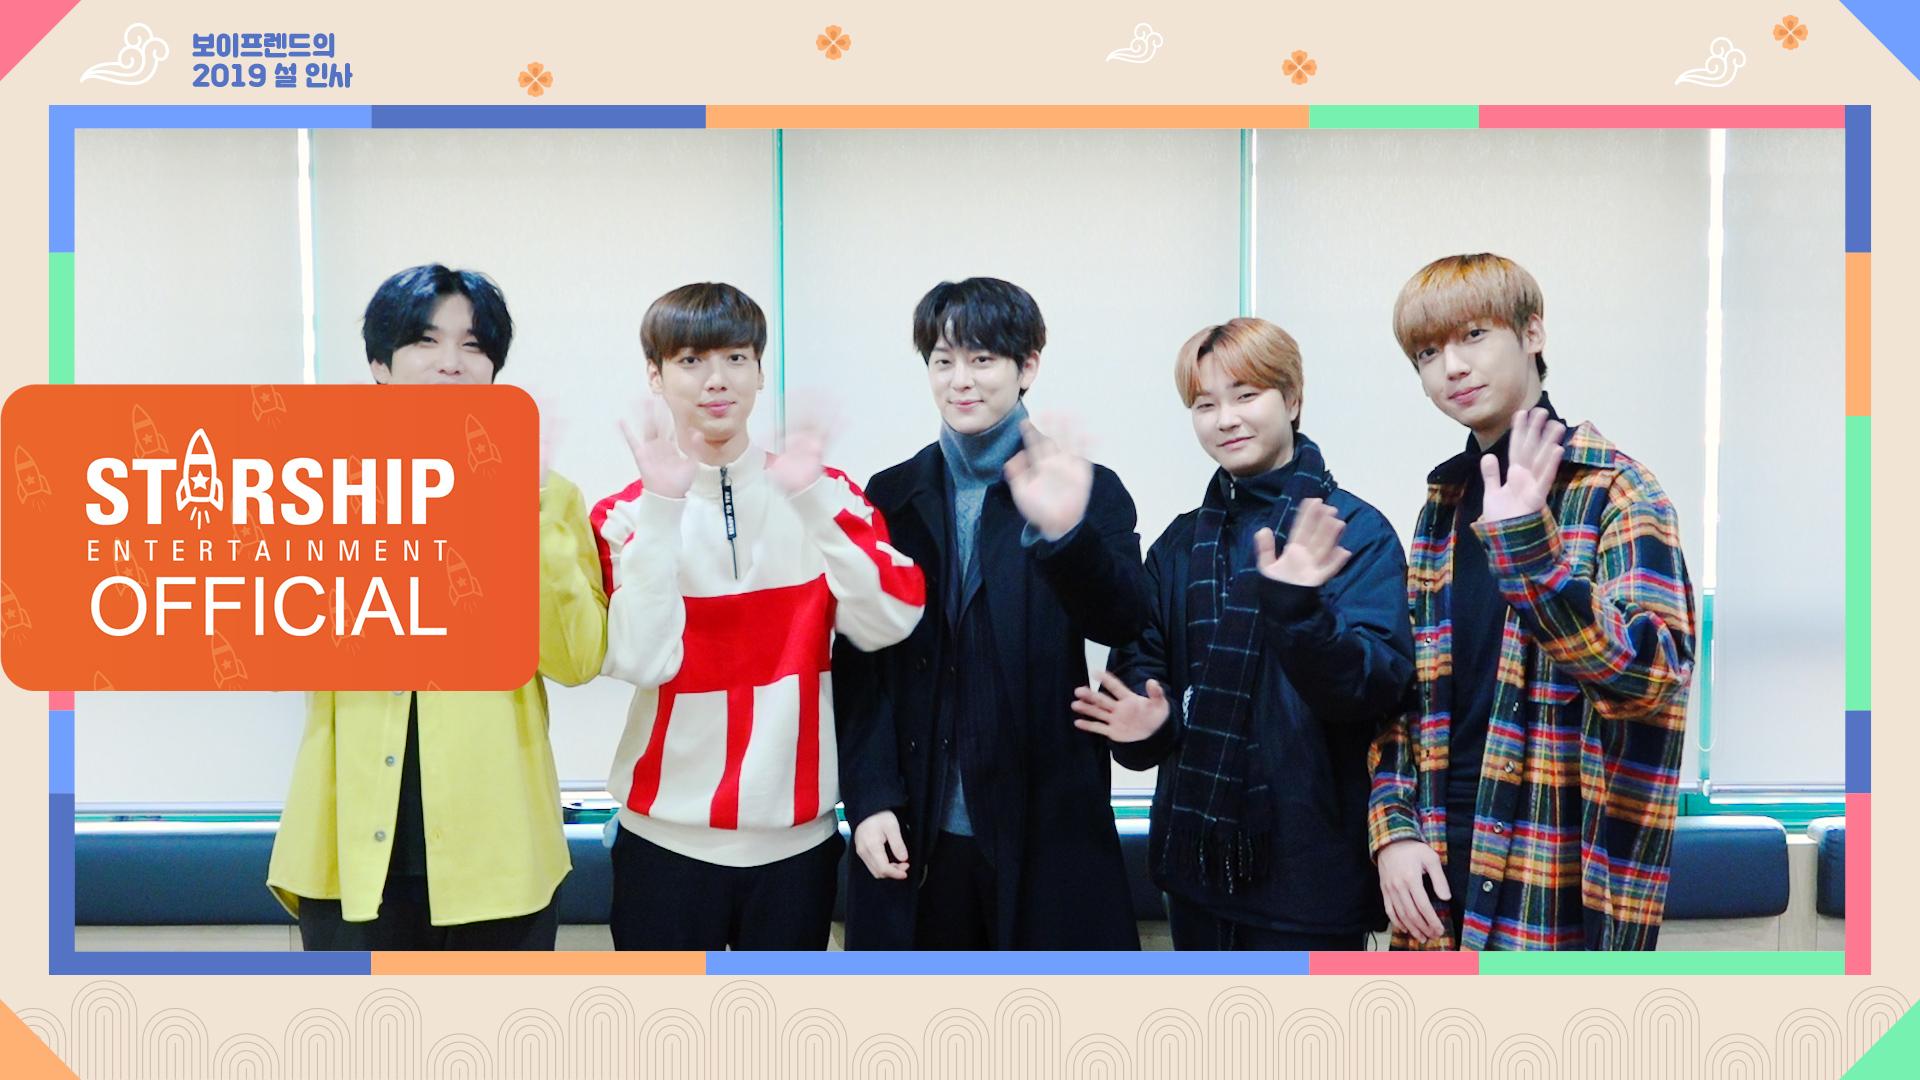 [Special Clip] 보이프렌드(BOYFRIEND) - 2019 설날인사 (2019 New Year's Greetings)